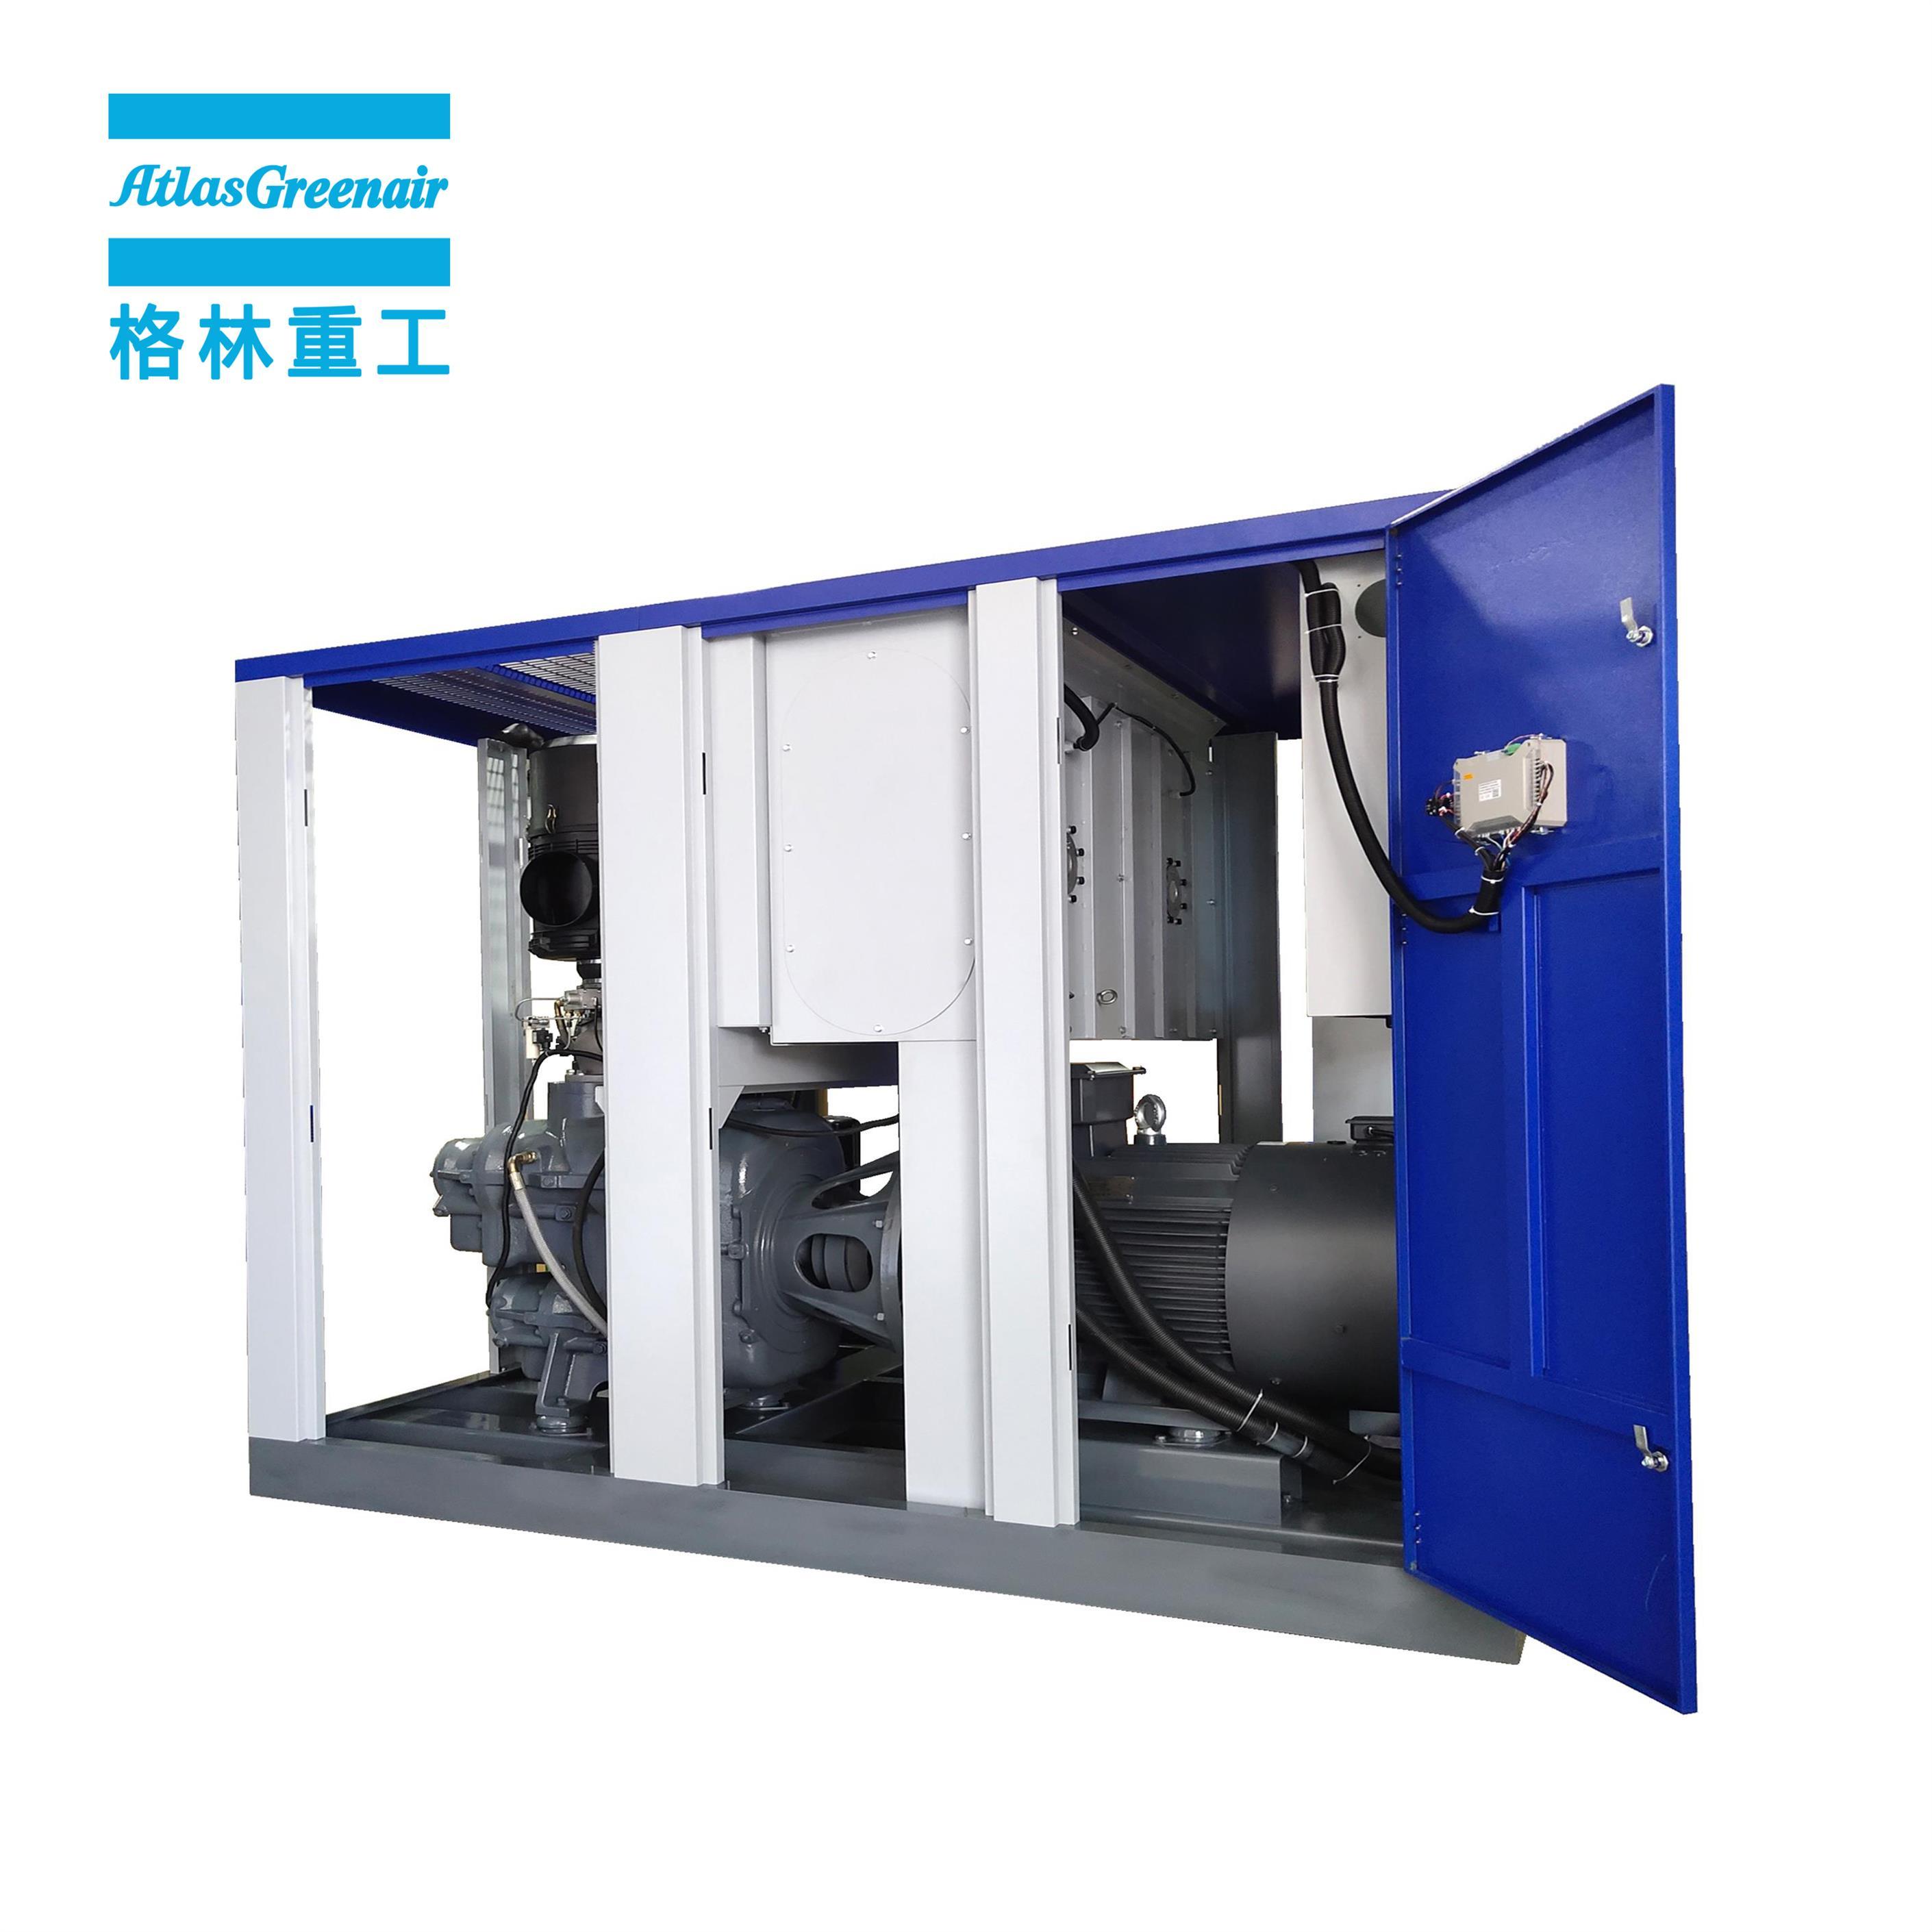 Atlas Greenair Screw Air Compressor cheap variable speed air compressor with a single air compressor for sale-1